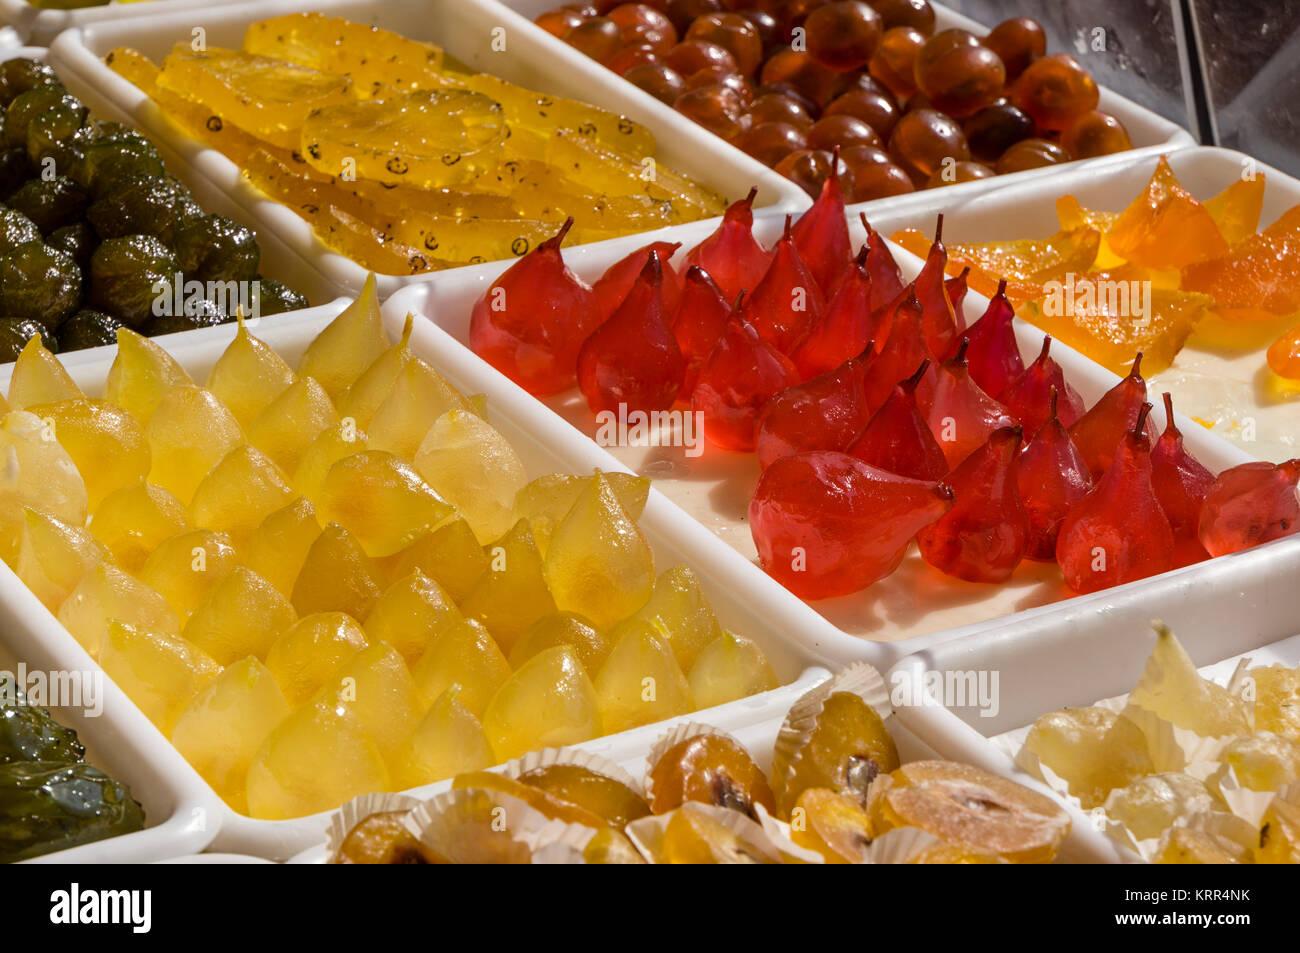 Senf Früchte, Cours Saleya, Nizza, Alpes Maritimes, Provence, Côte d'Azur, Mittelmeer, Frankreich, Stockbild